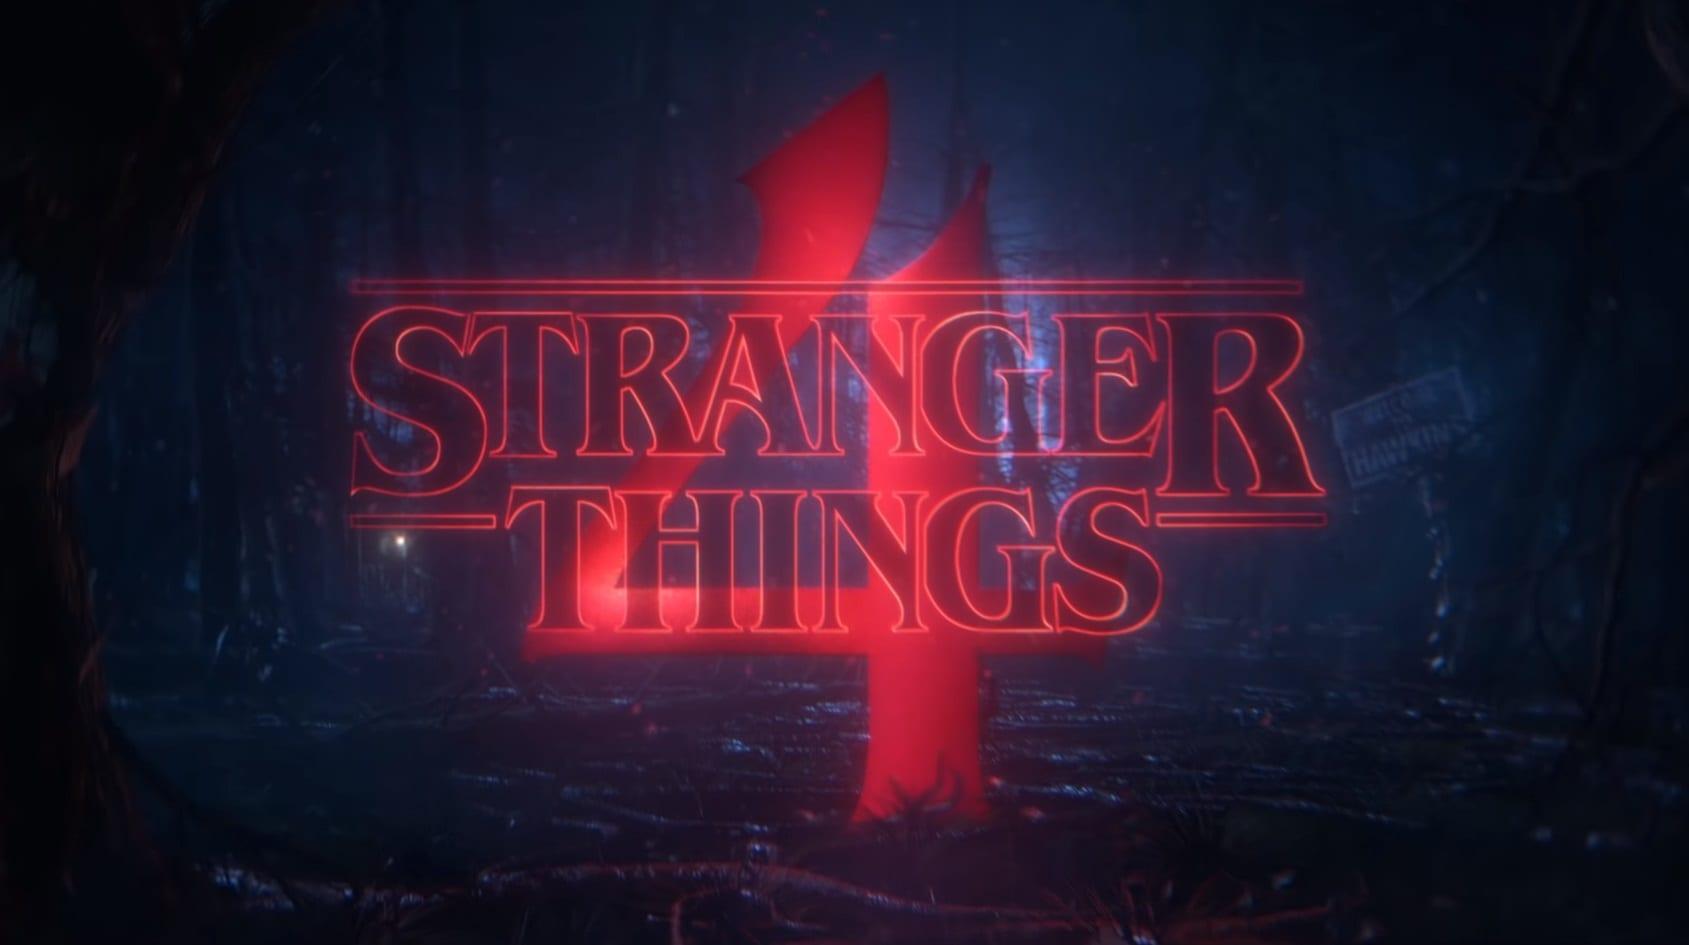 Stranger Things 4 uscirà nel 2022 secondo Finn Wolfhard